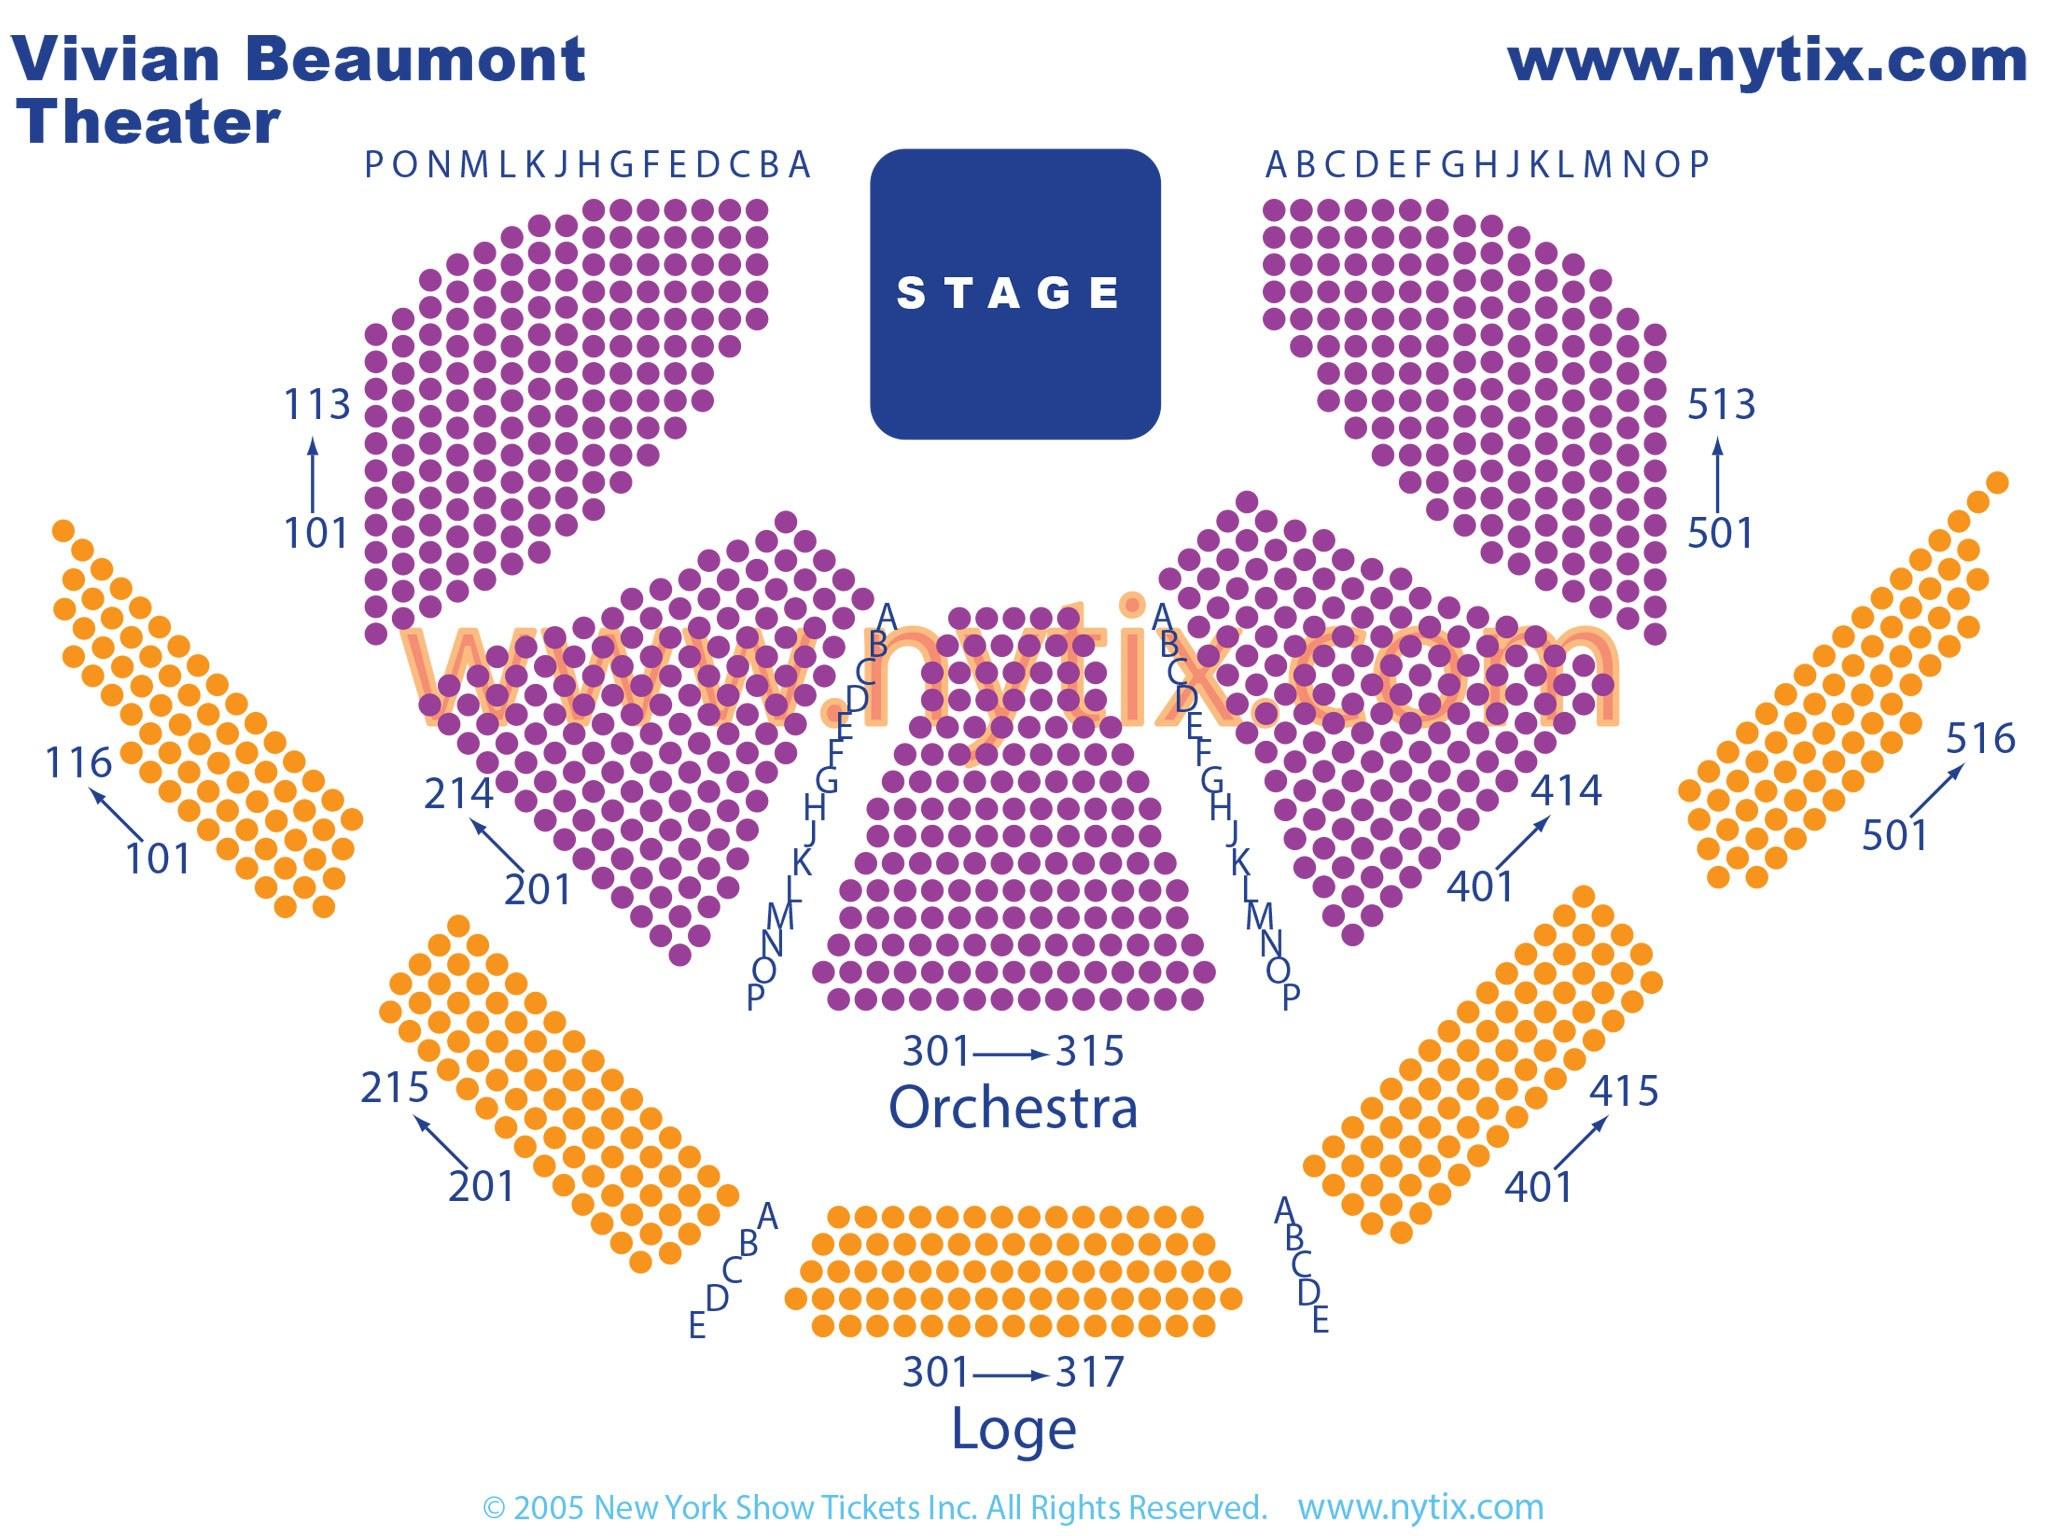 Vivian Beaumont Theatre Seating Chart